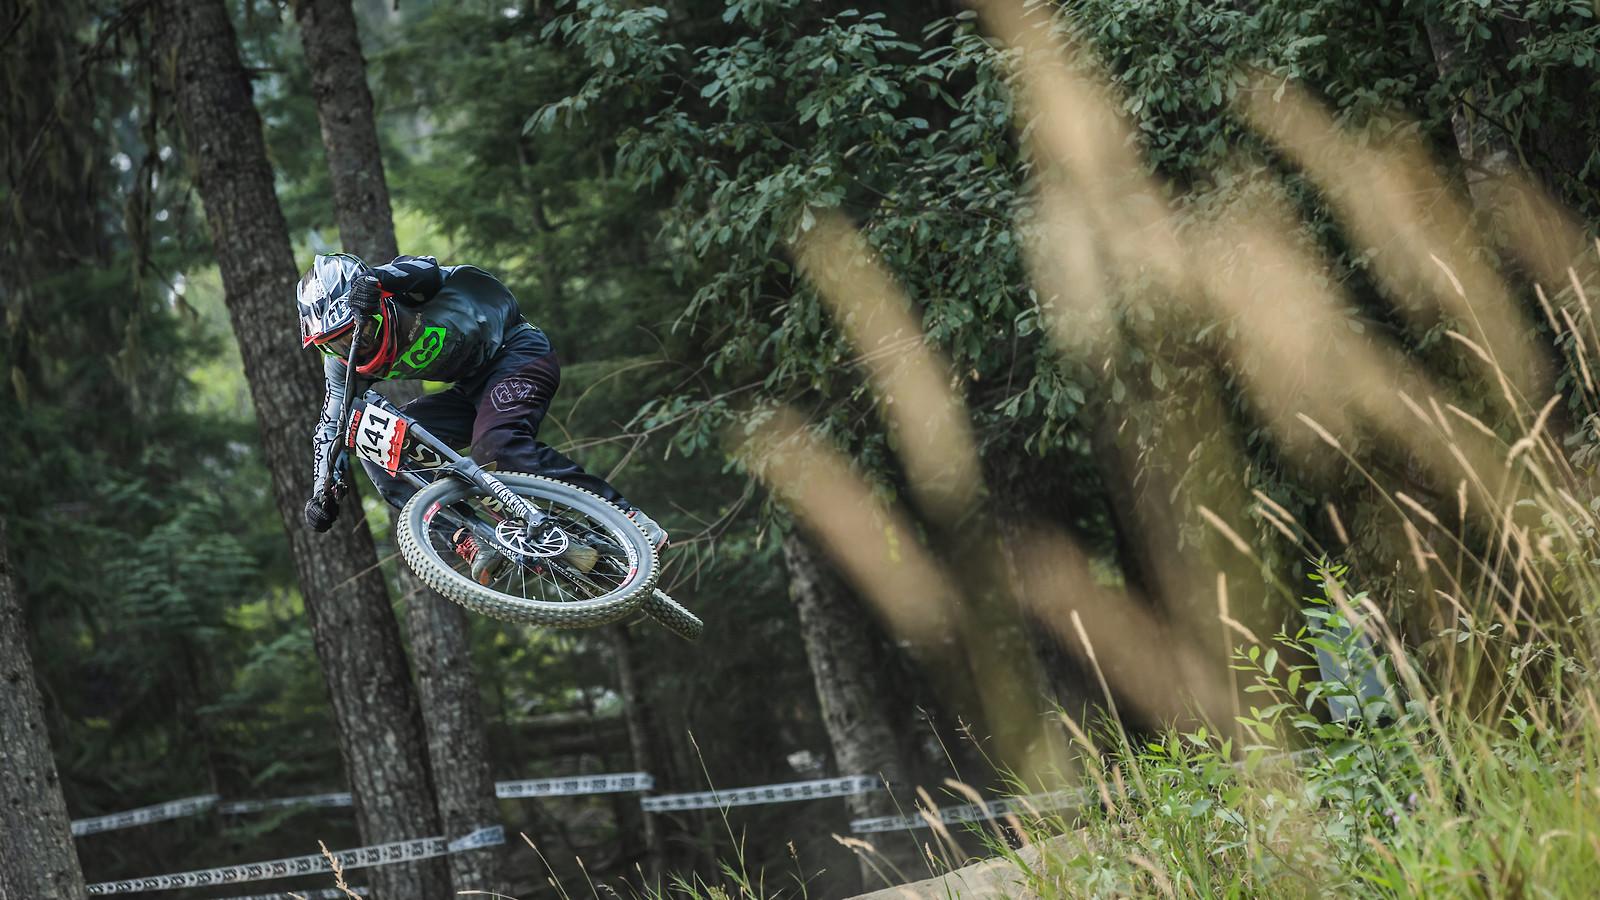 47083539201 8bd5f2ac97 o - phunkt.com - Mountain Biking Pictures - Vital MTB